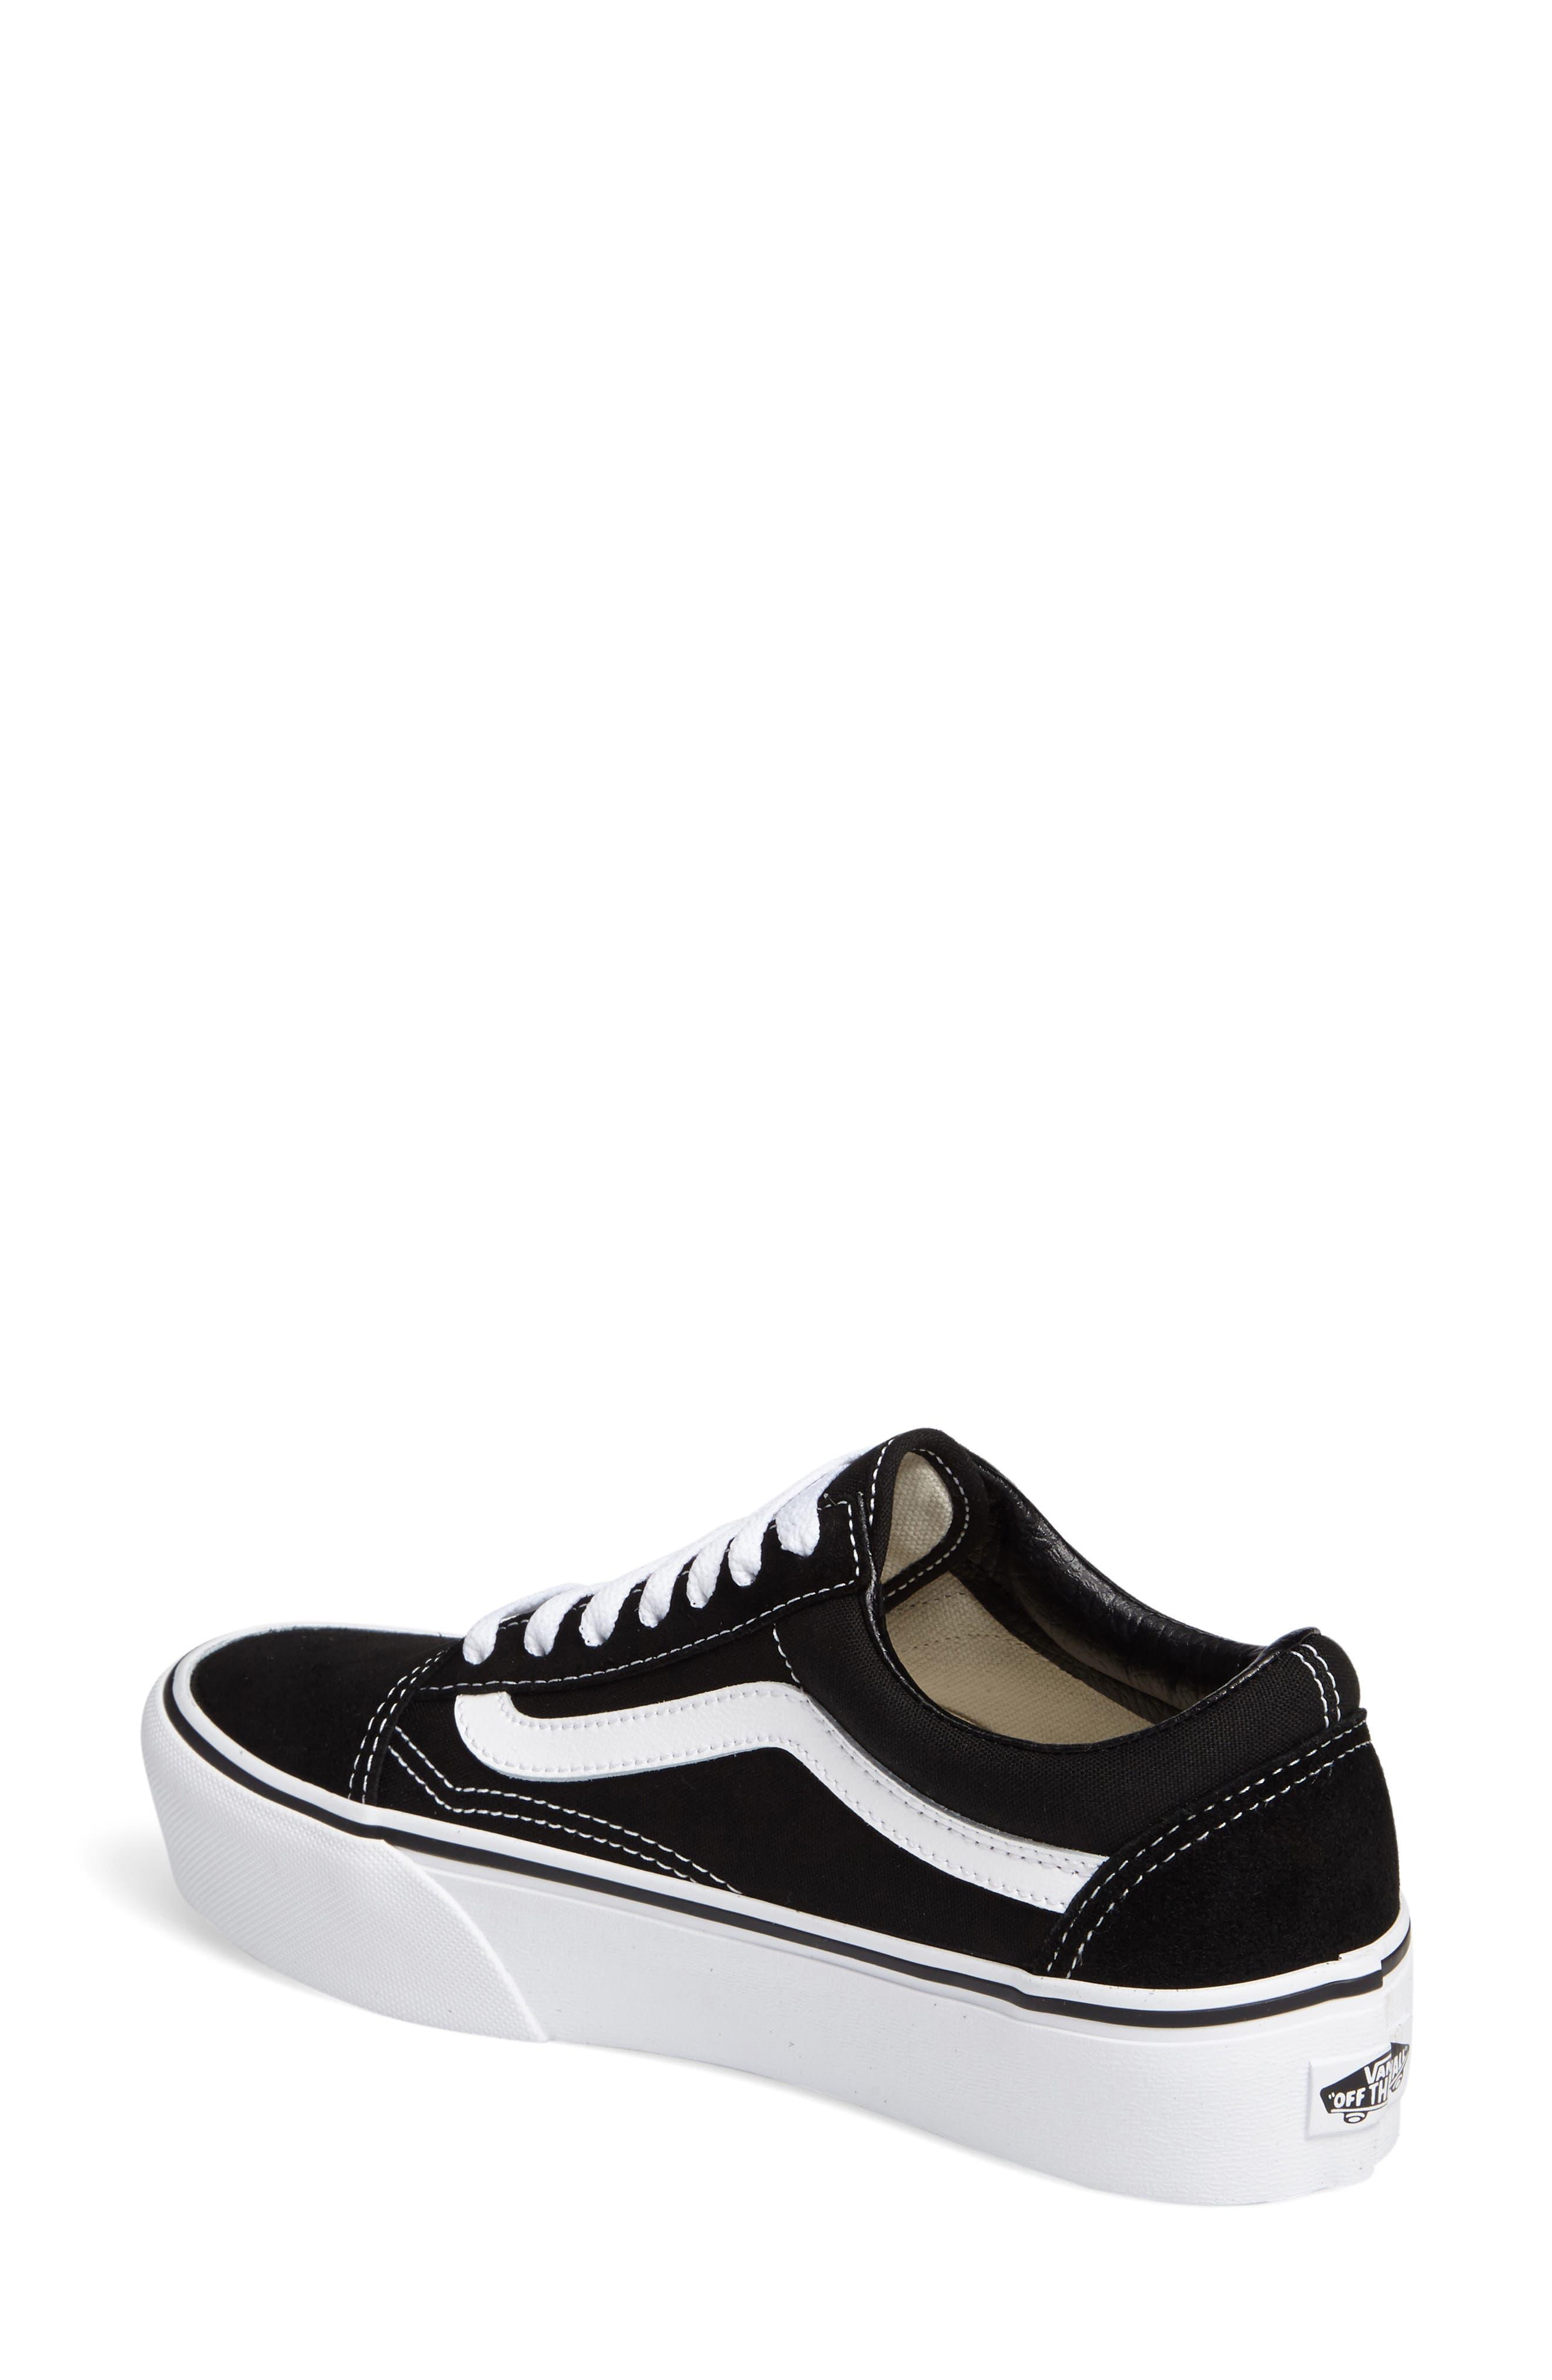 Old Skool Platform Sneaker,                             Alternate thumbnail 9, color,